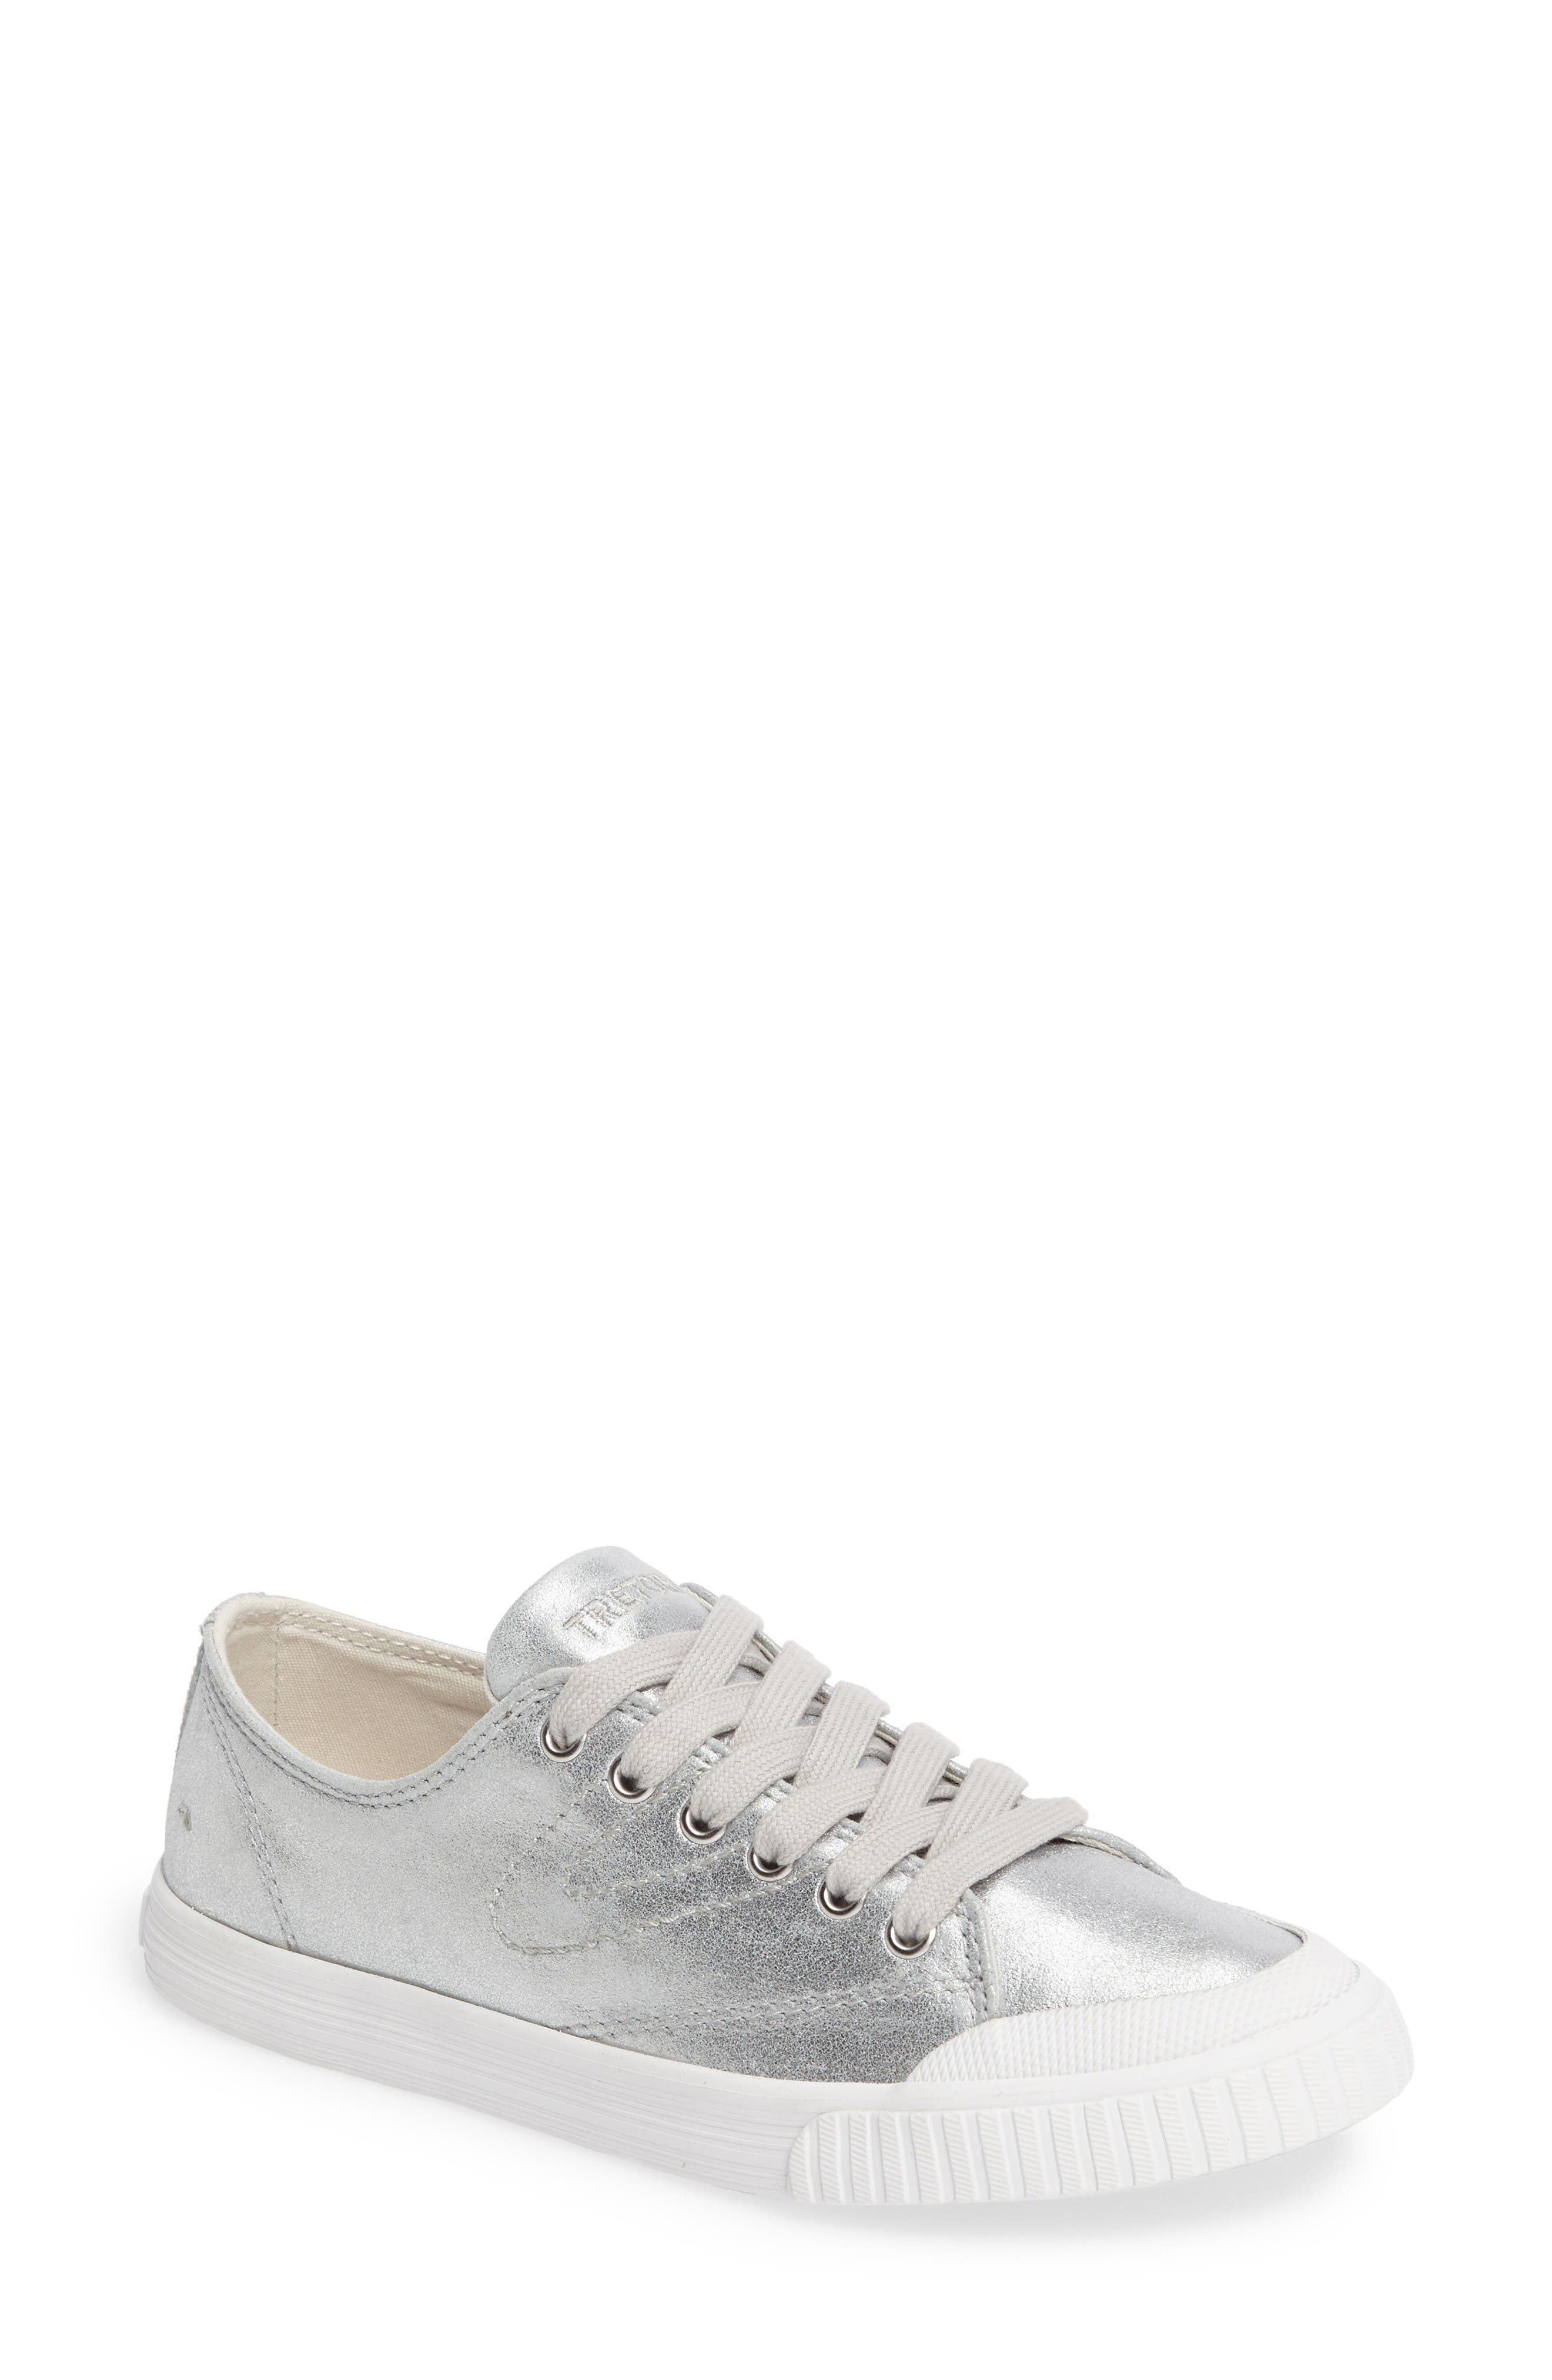 Marley Sneaker,                         Main,                         color, Silver